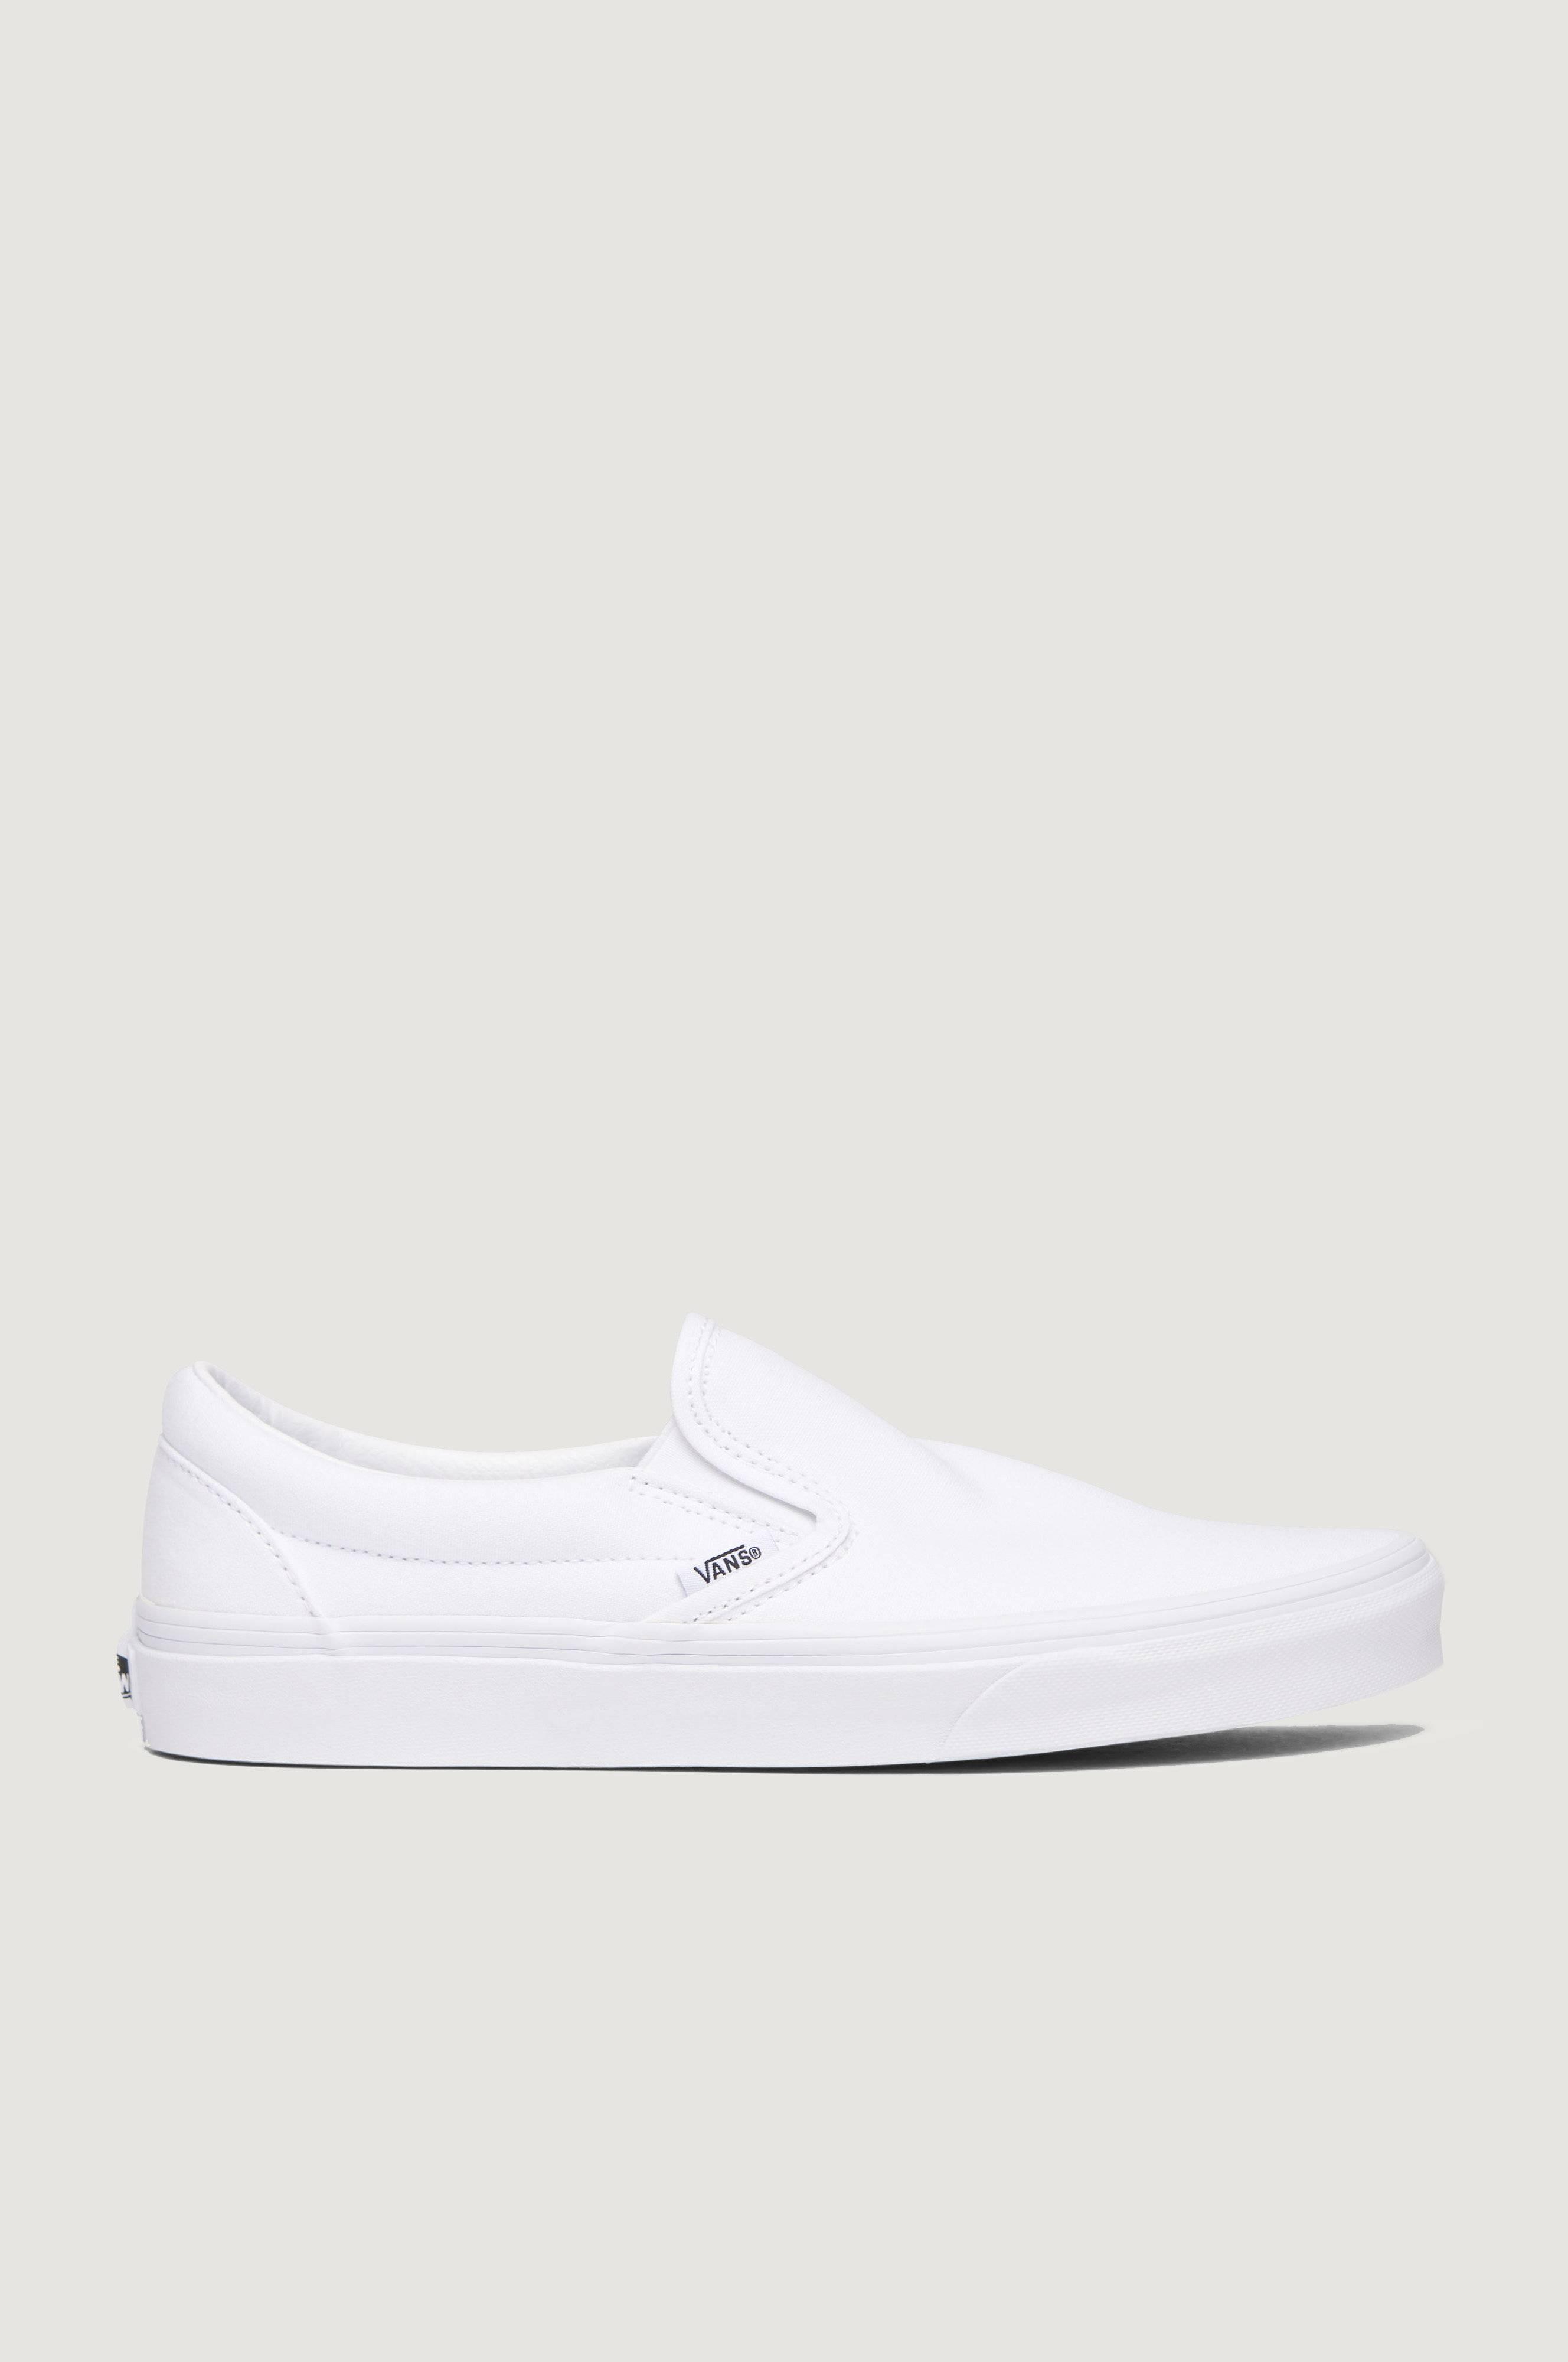 VANS Classic Slip-On Sneakers & textilskor Vit